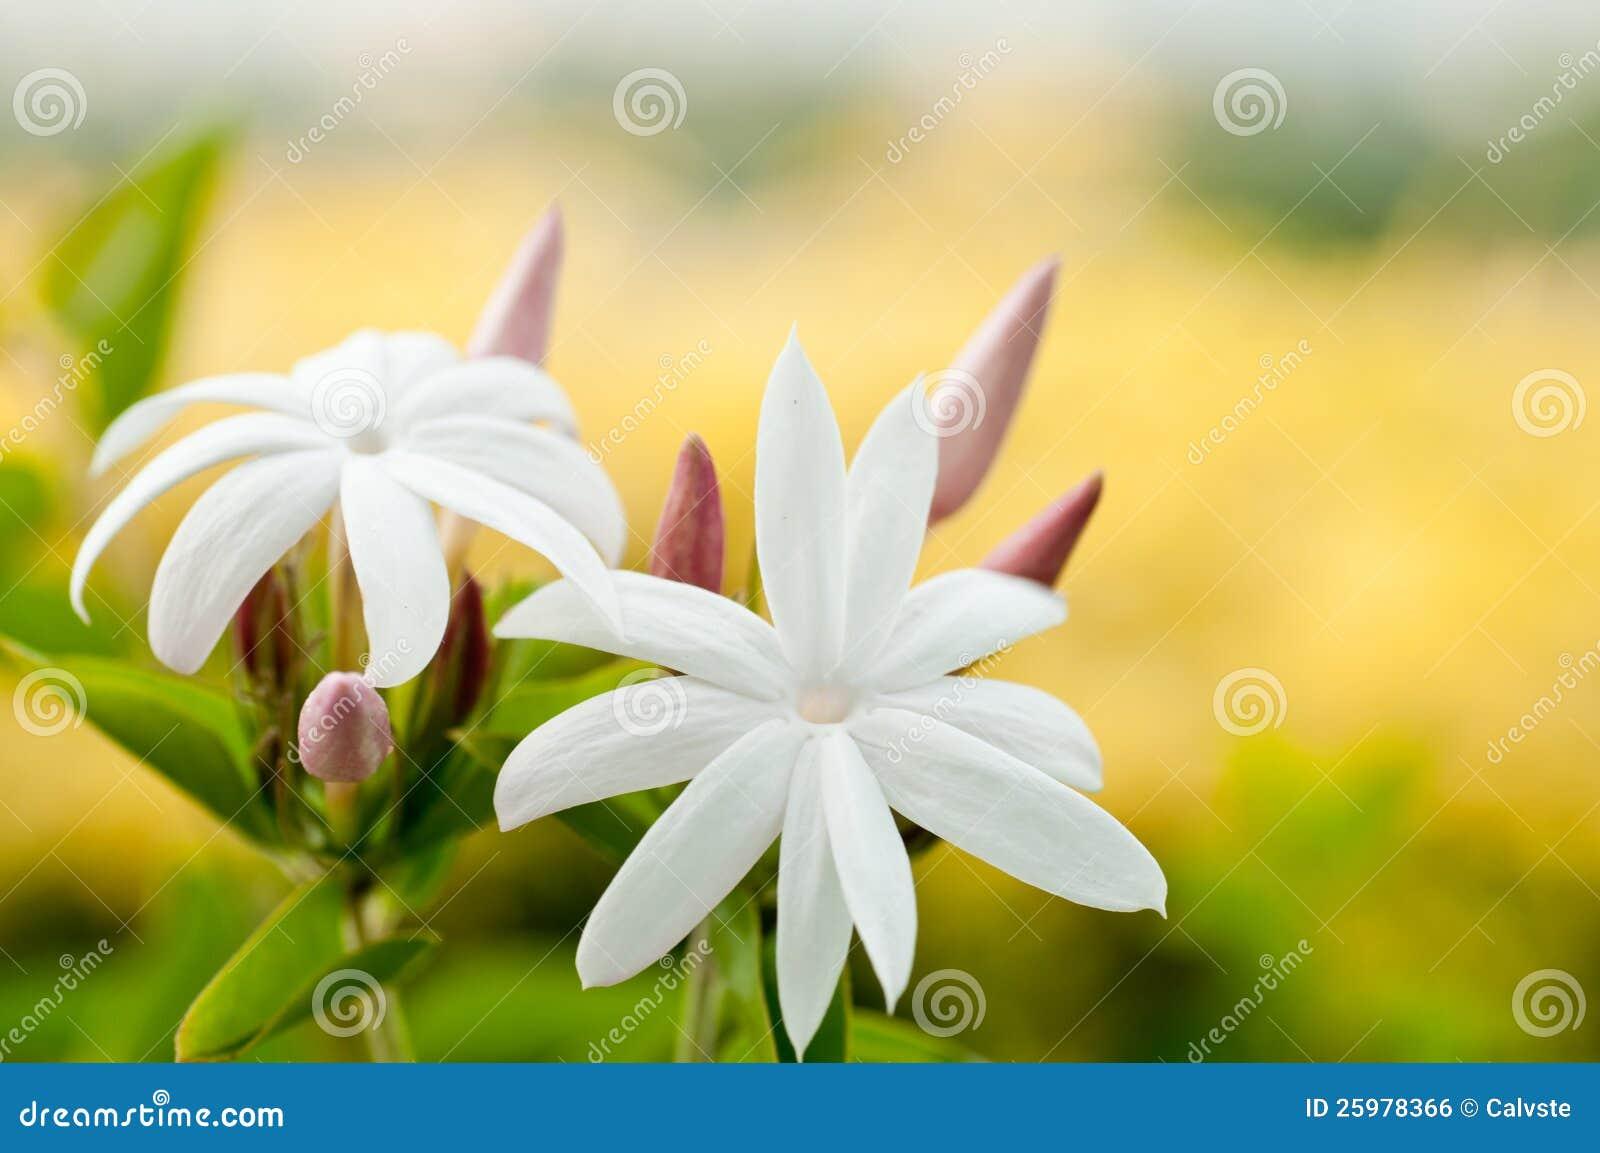 White jasmine flowers stock photo image of pink petal 25978366 white jasmine flowers izmirmasajfo